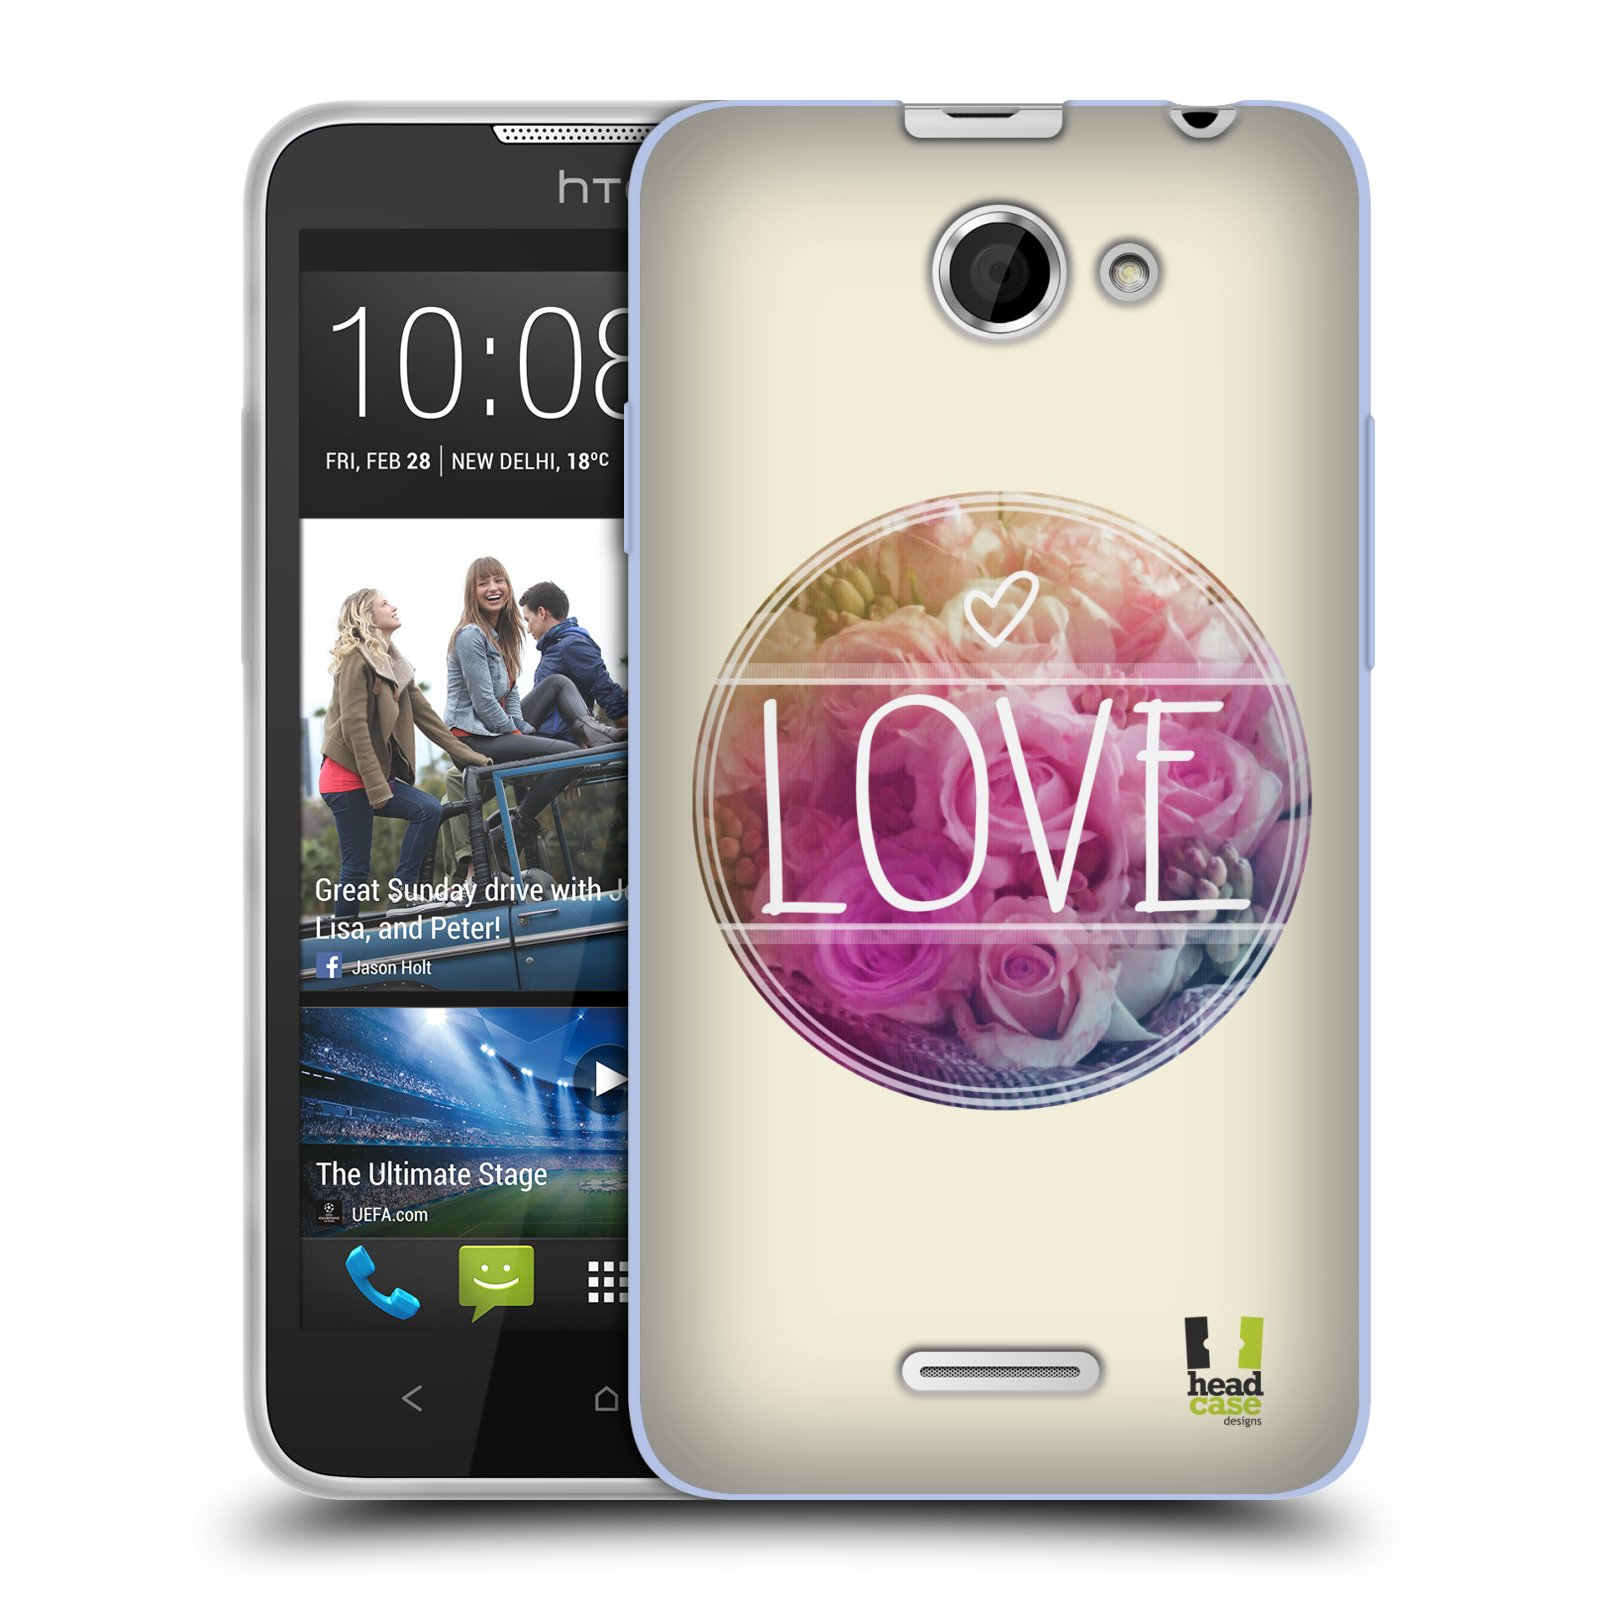 Silikonové pouzdro na mobil HTC Desire 516 HEAD CASE INSPIRACE V KRUHU LÁSKA (Silikonový kryt či obal na mobilní telefon HTC Desire 516 Dual SIM)